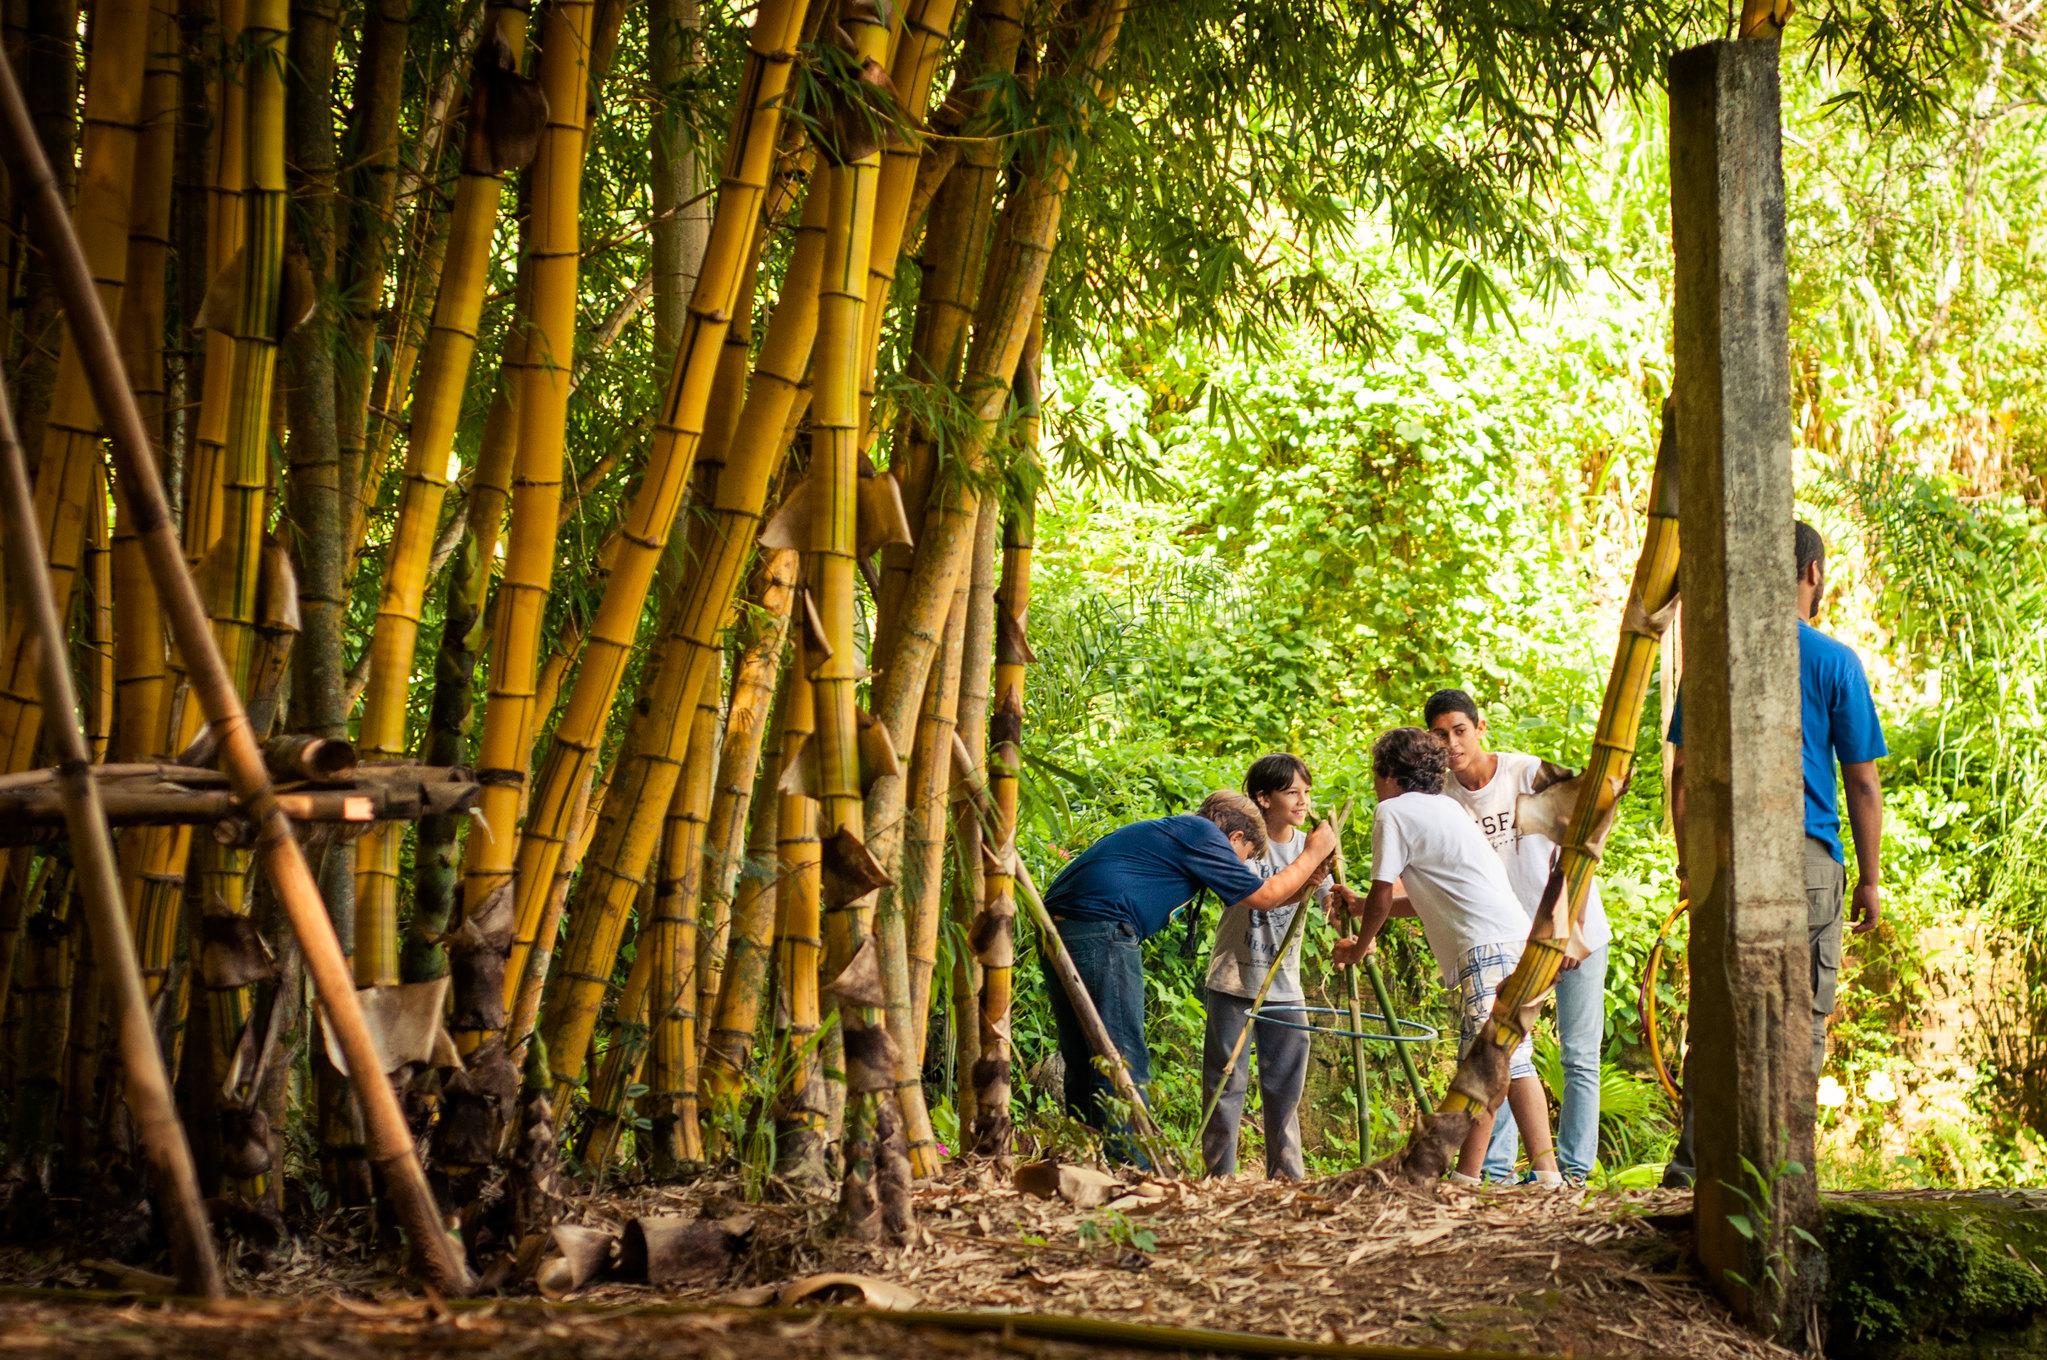 Atividade no bambuzal